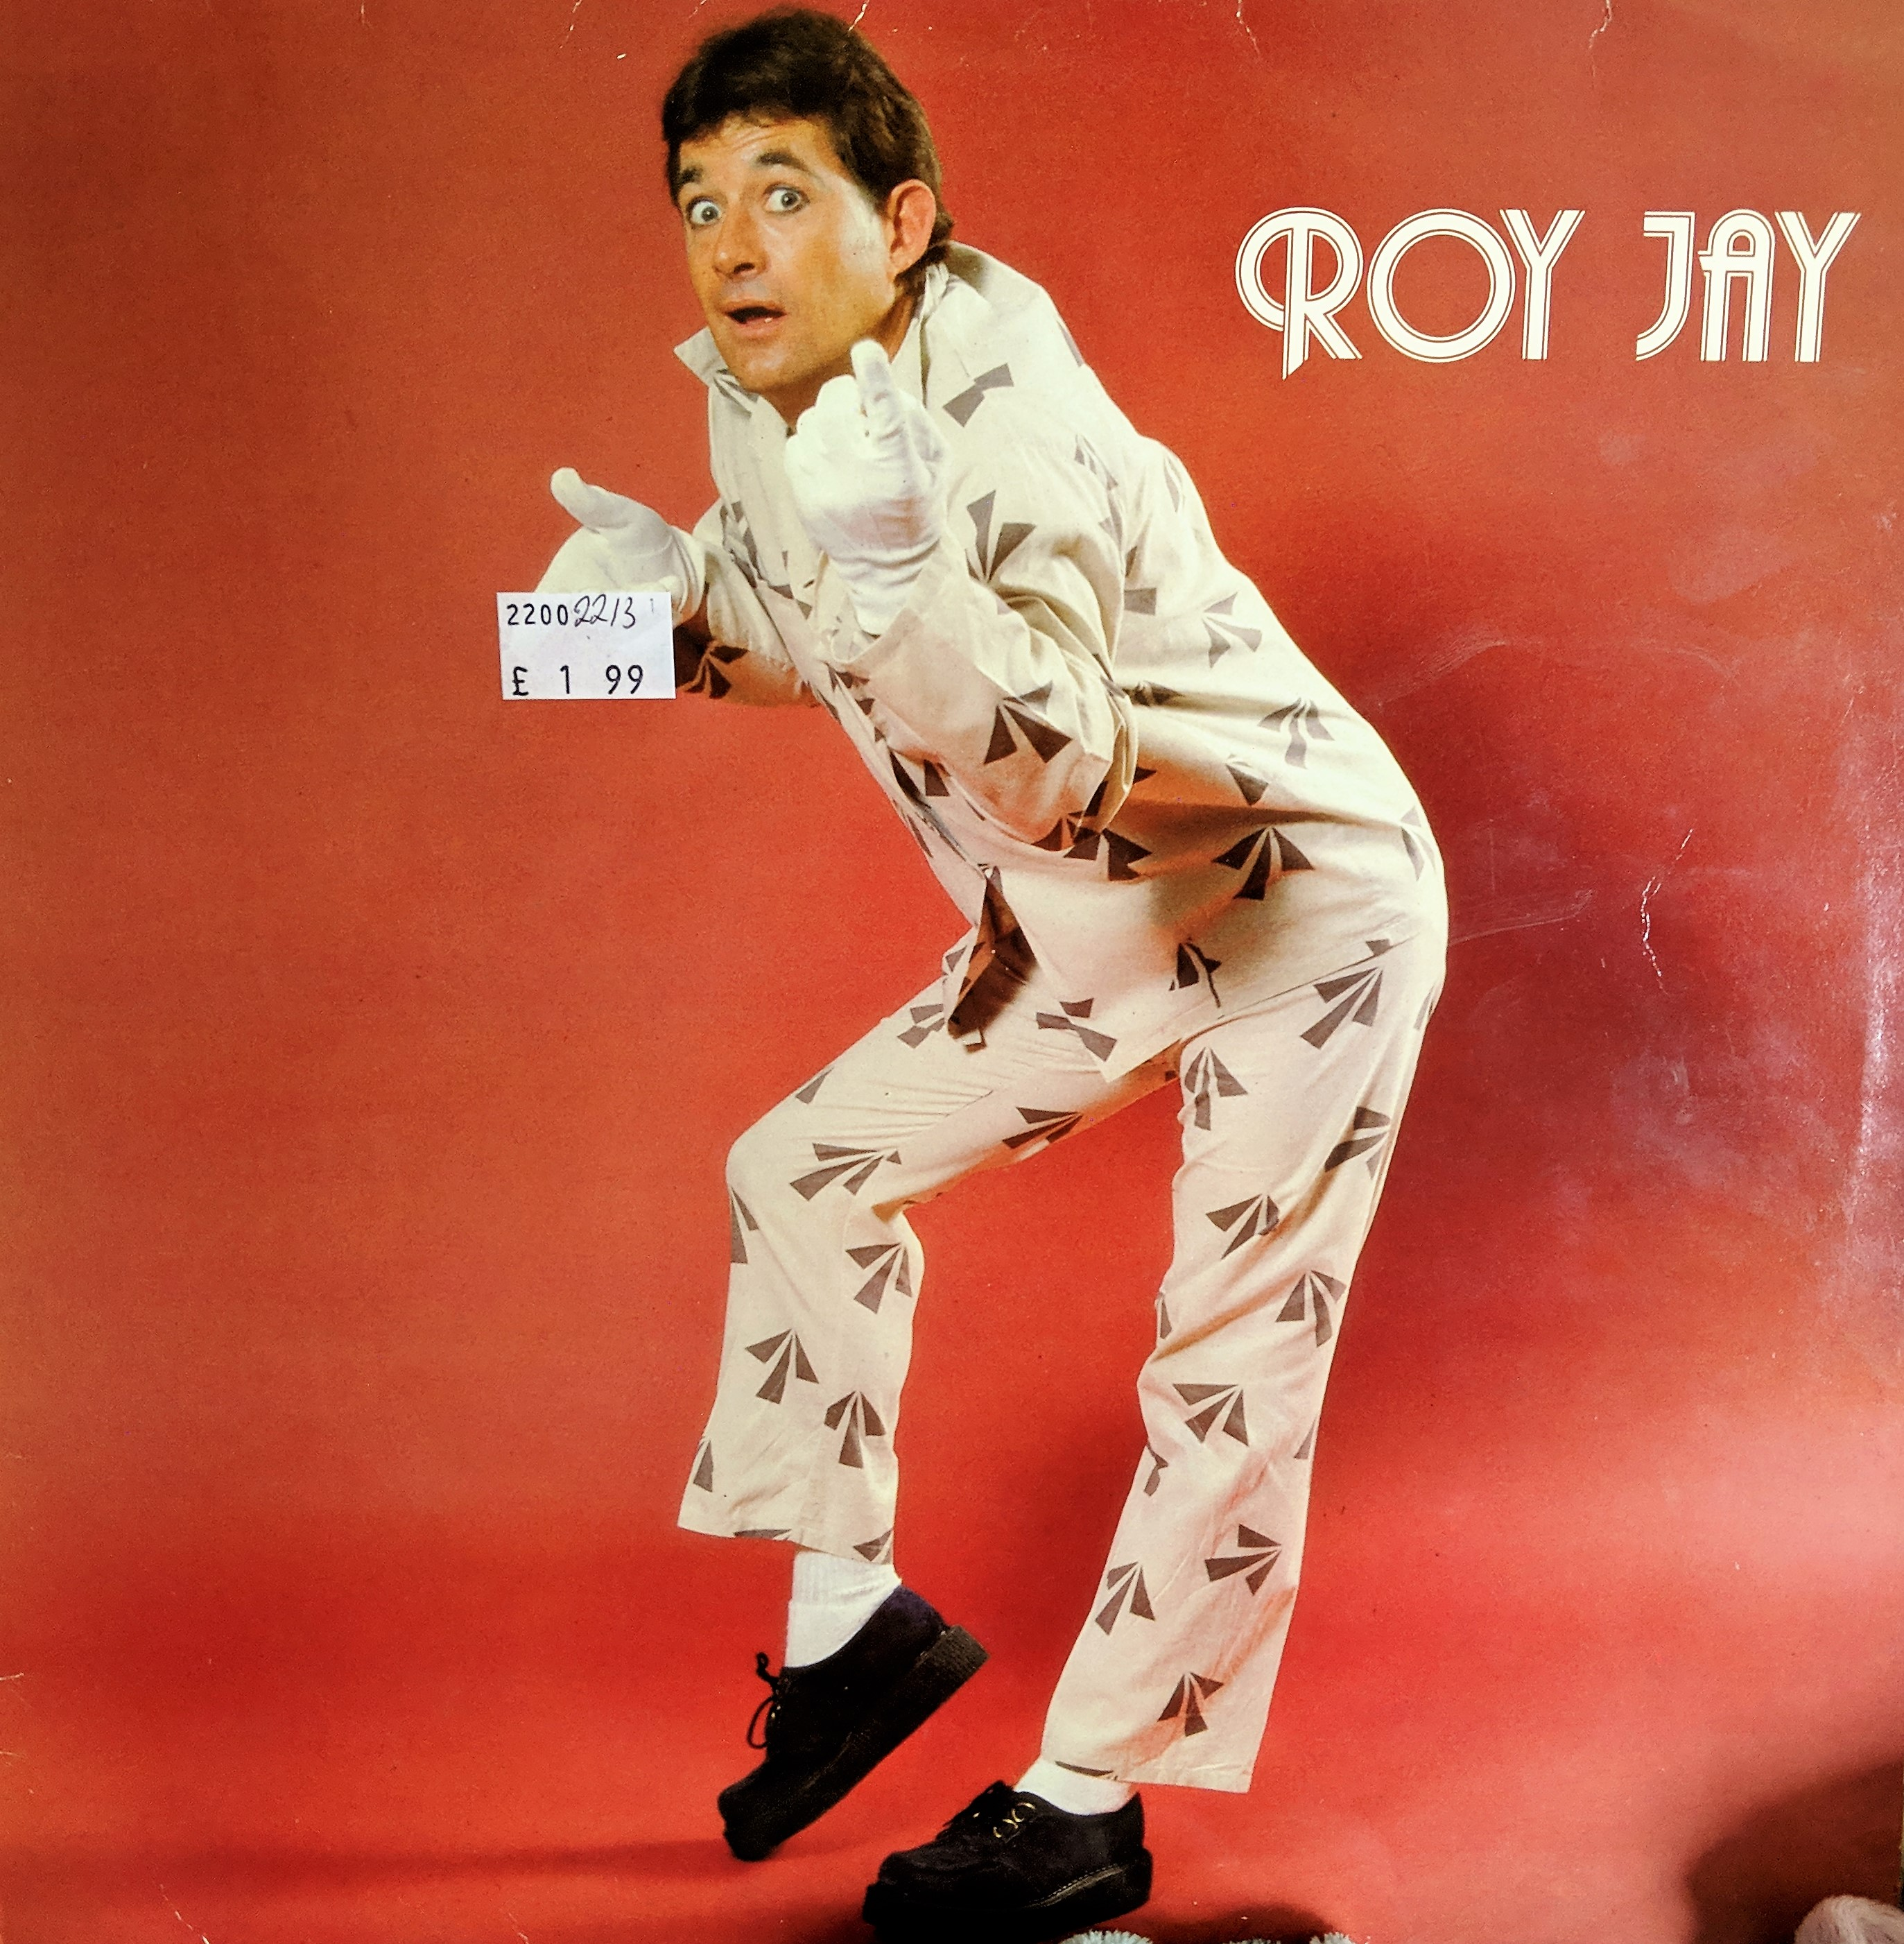 Roy Jay Album